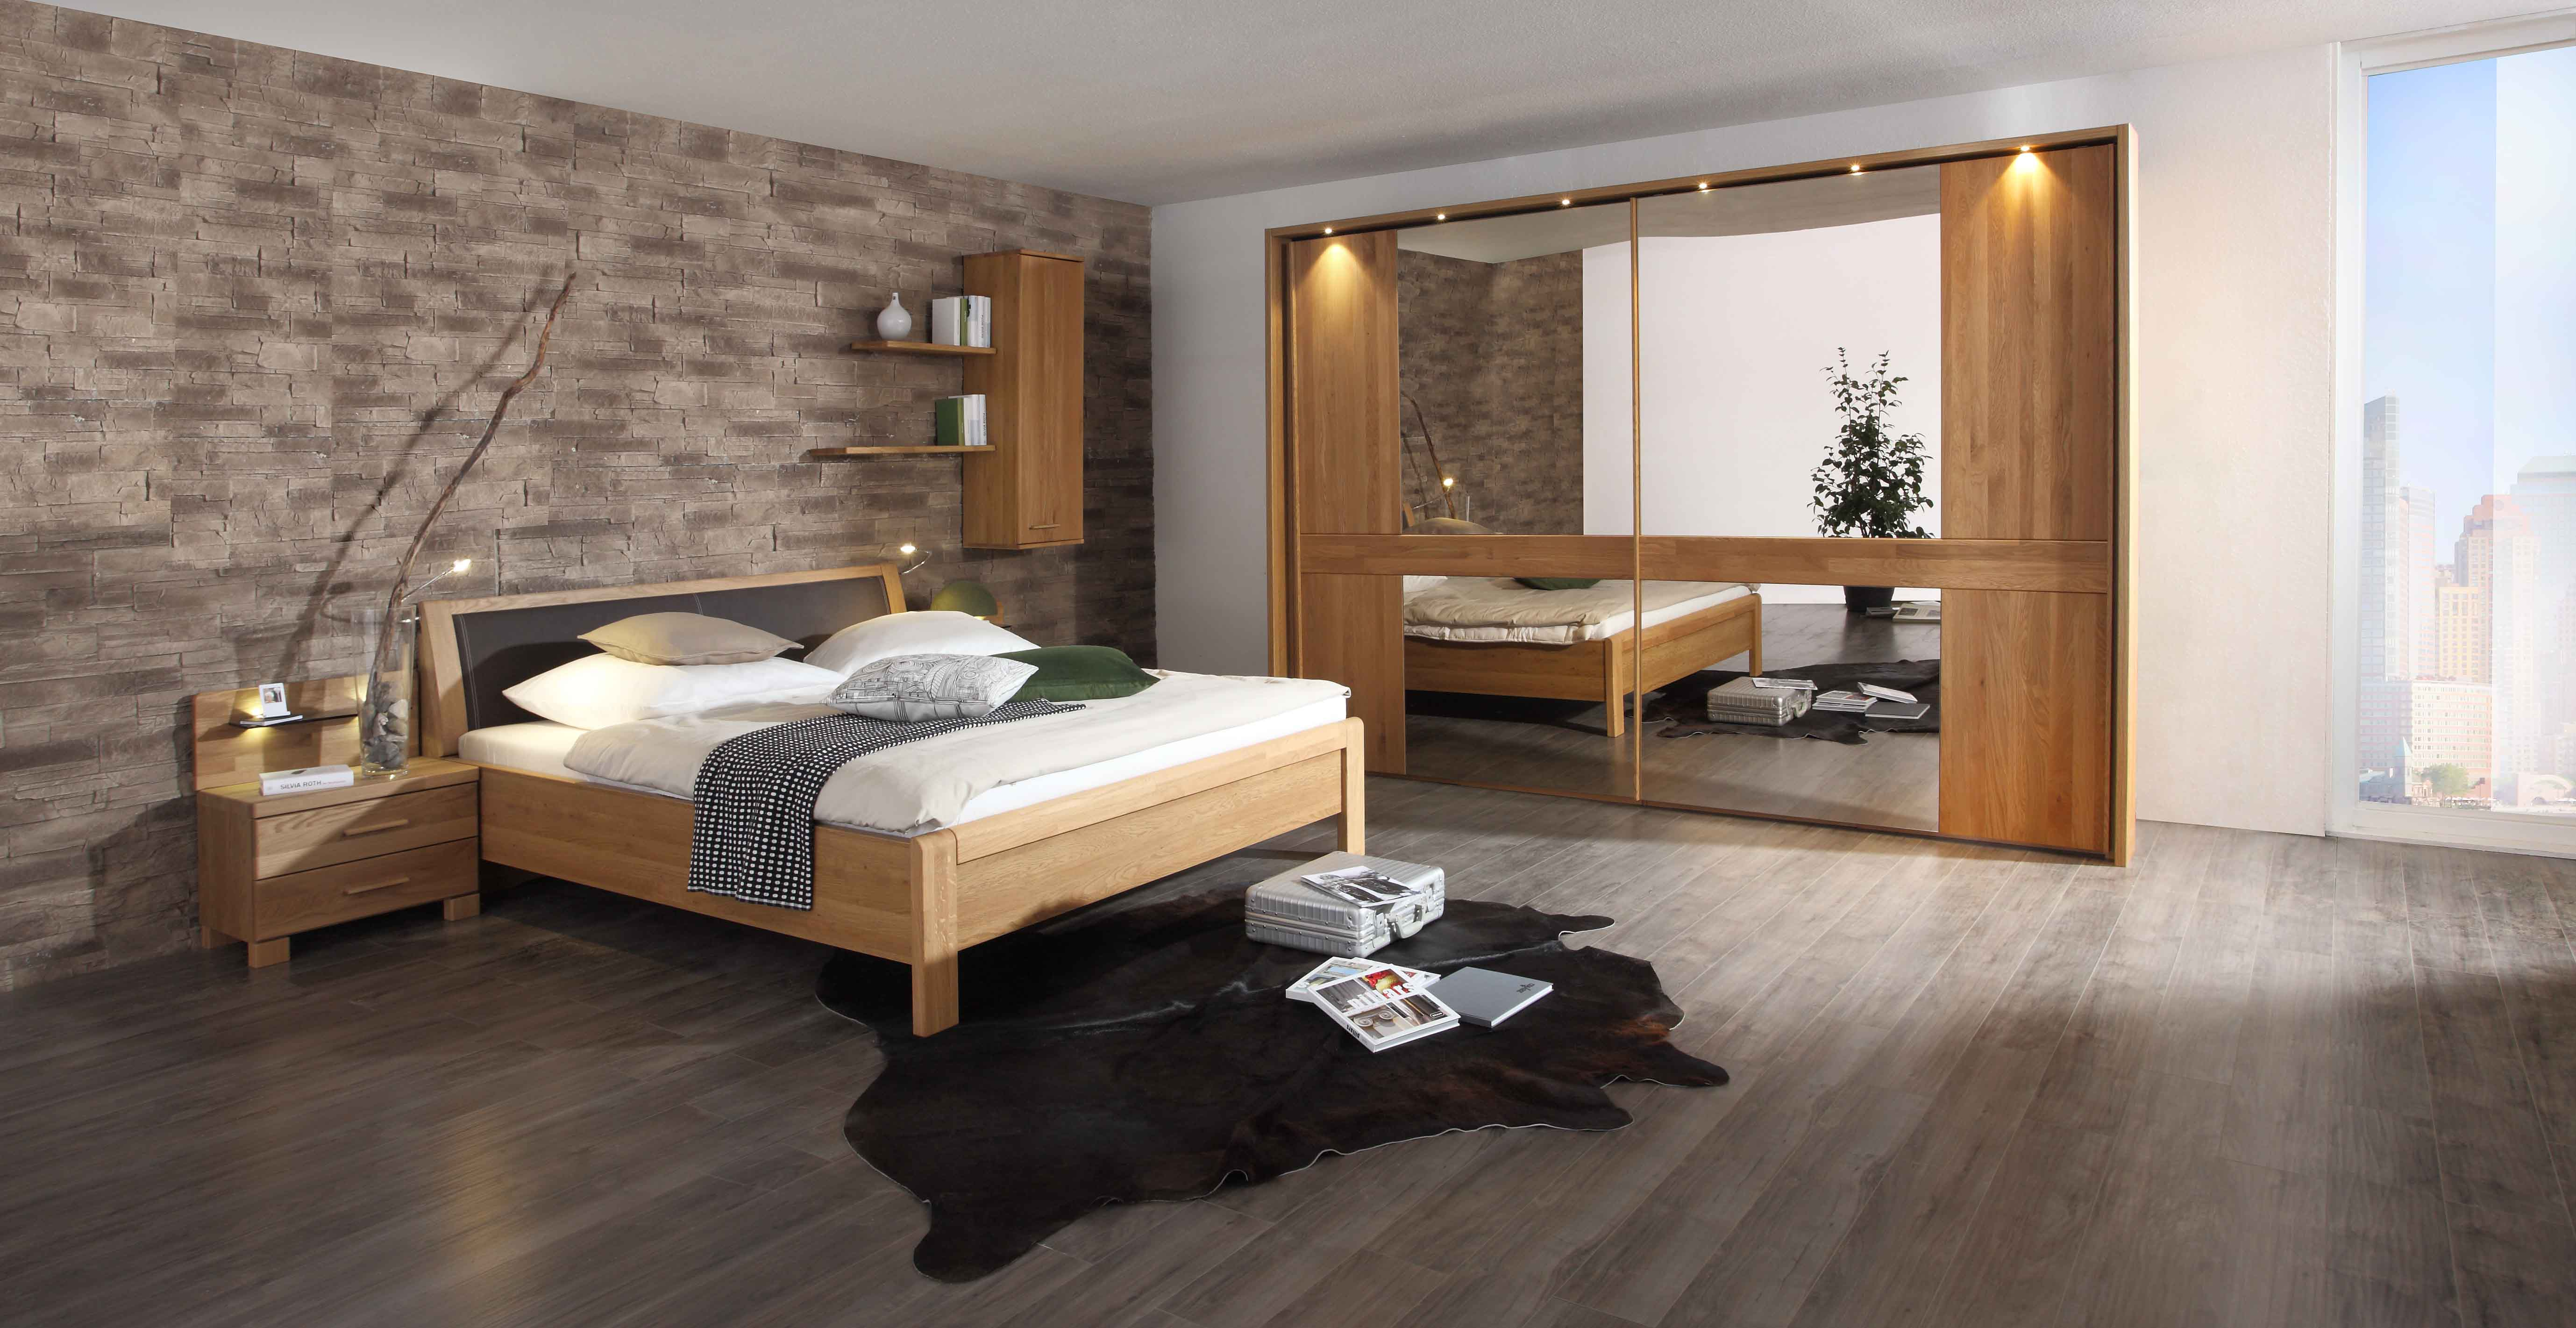 Slaapkamer Design Programma : Home › Slapen › Slaapkamers › FARO ...